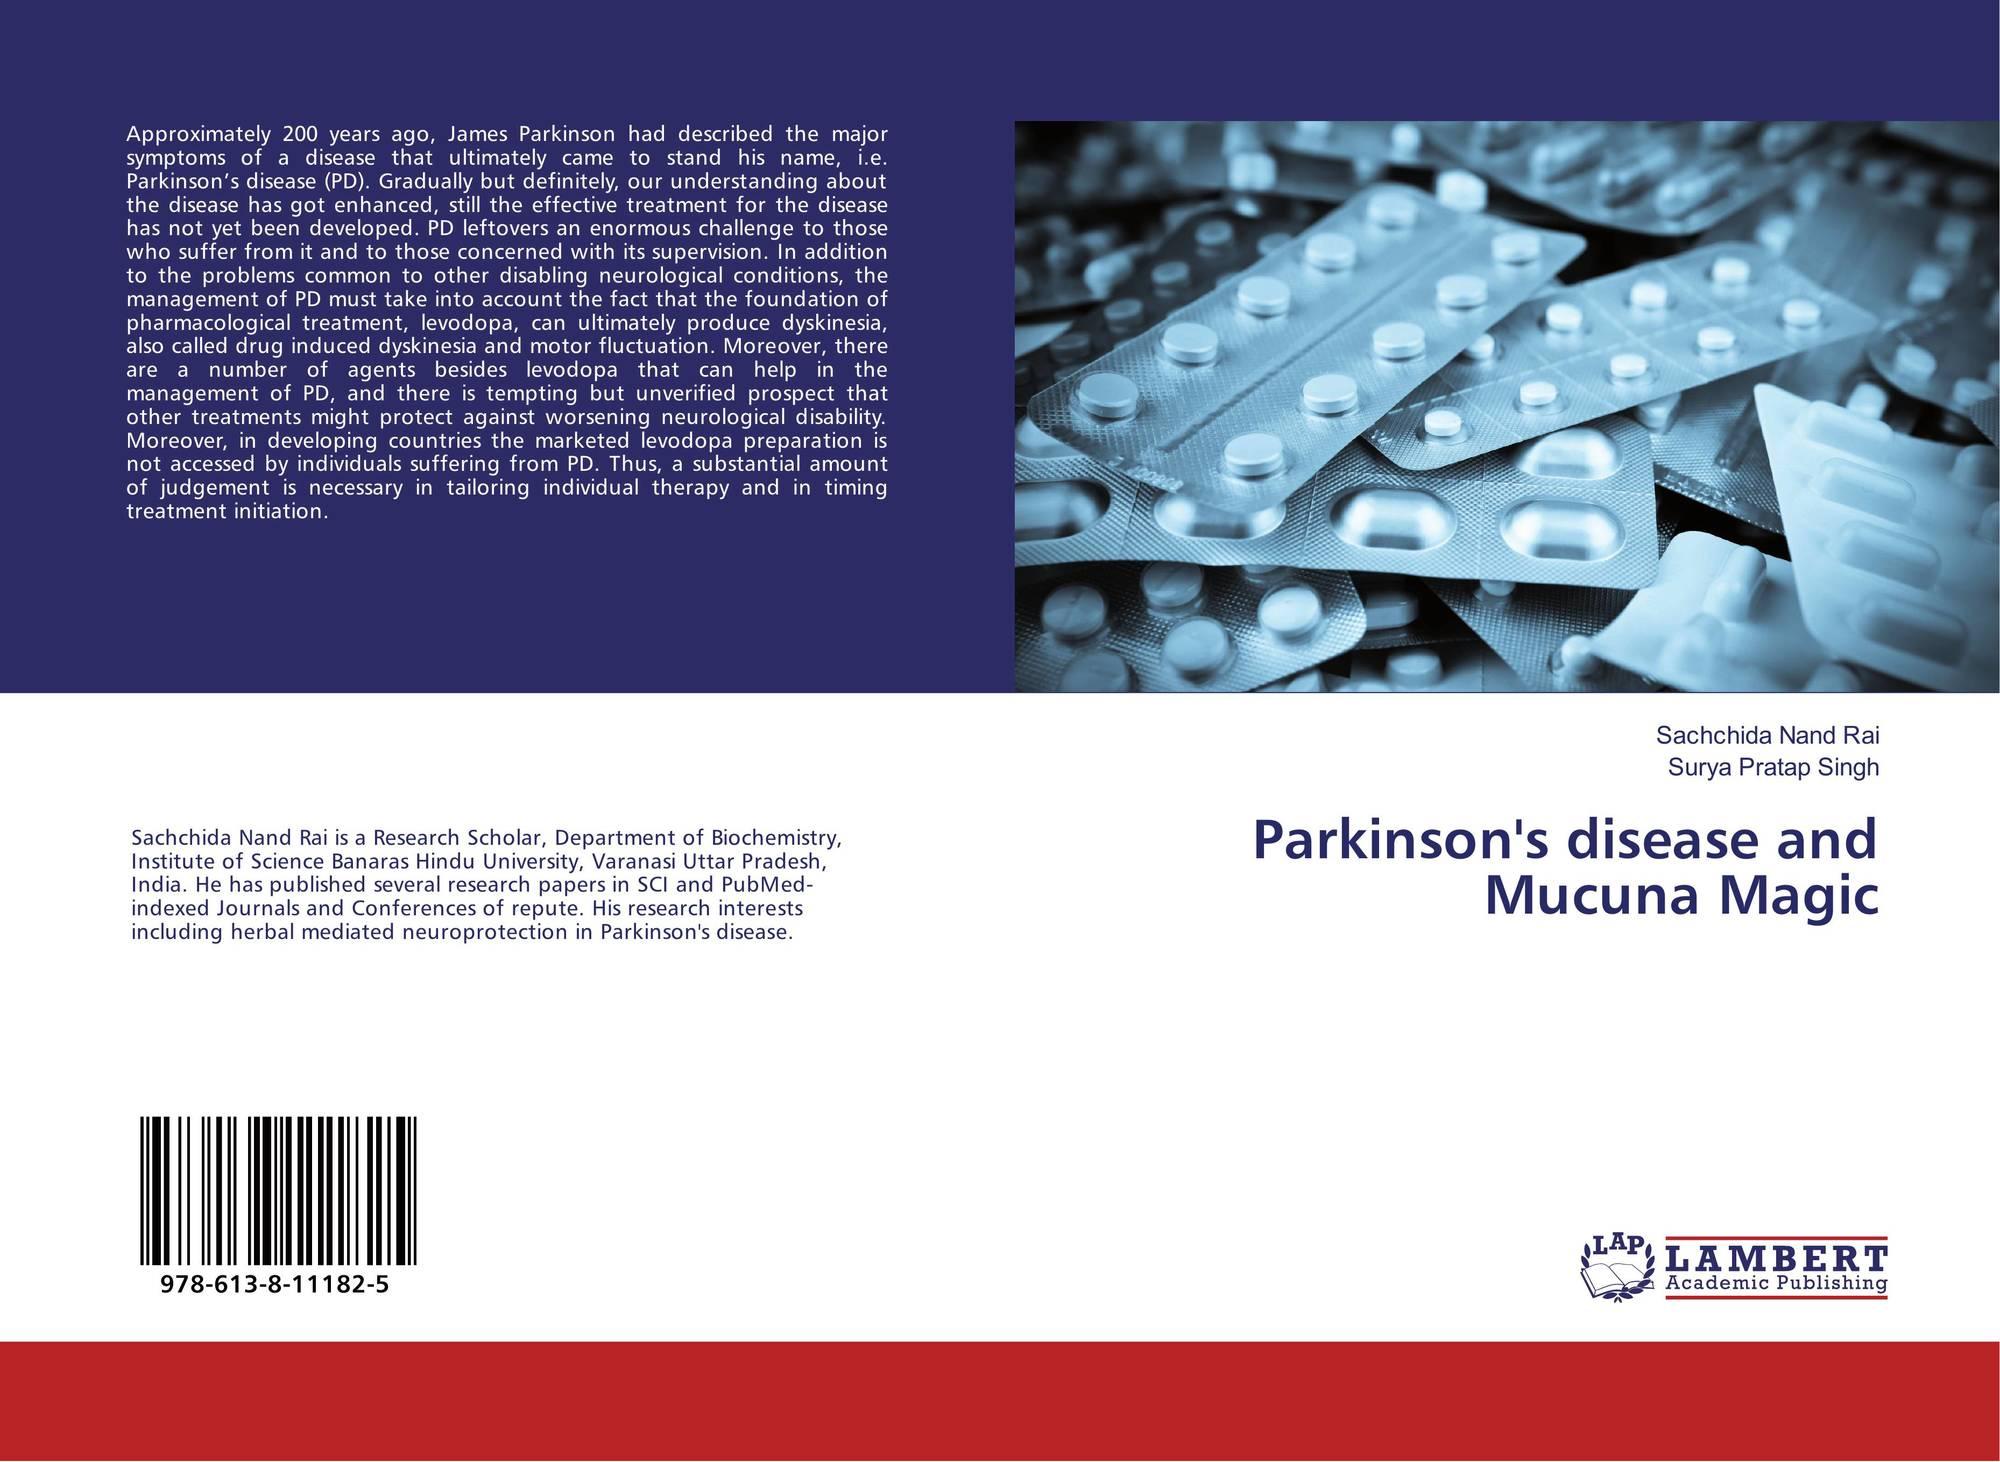 parkinsons disease research paper